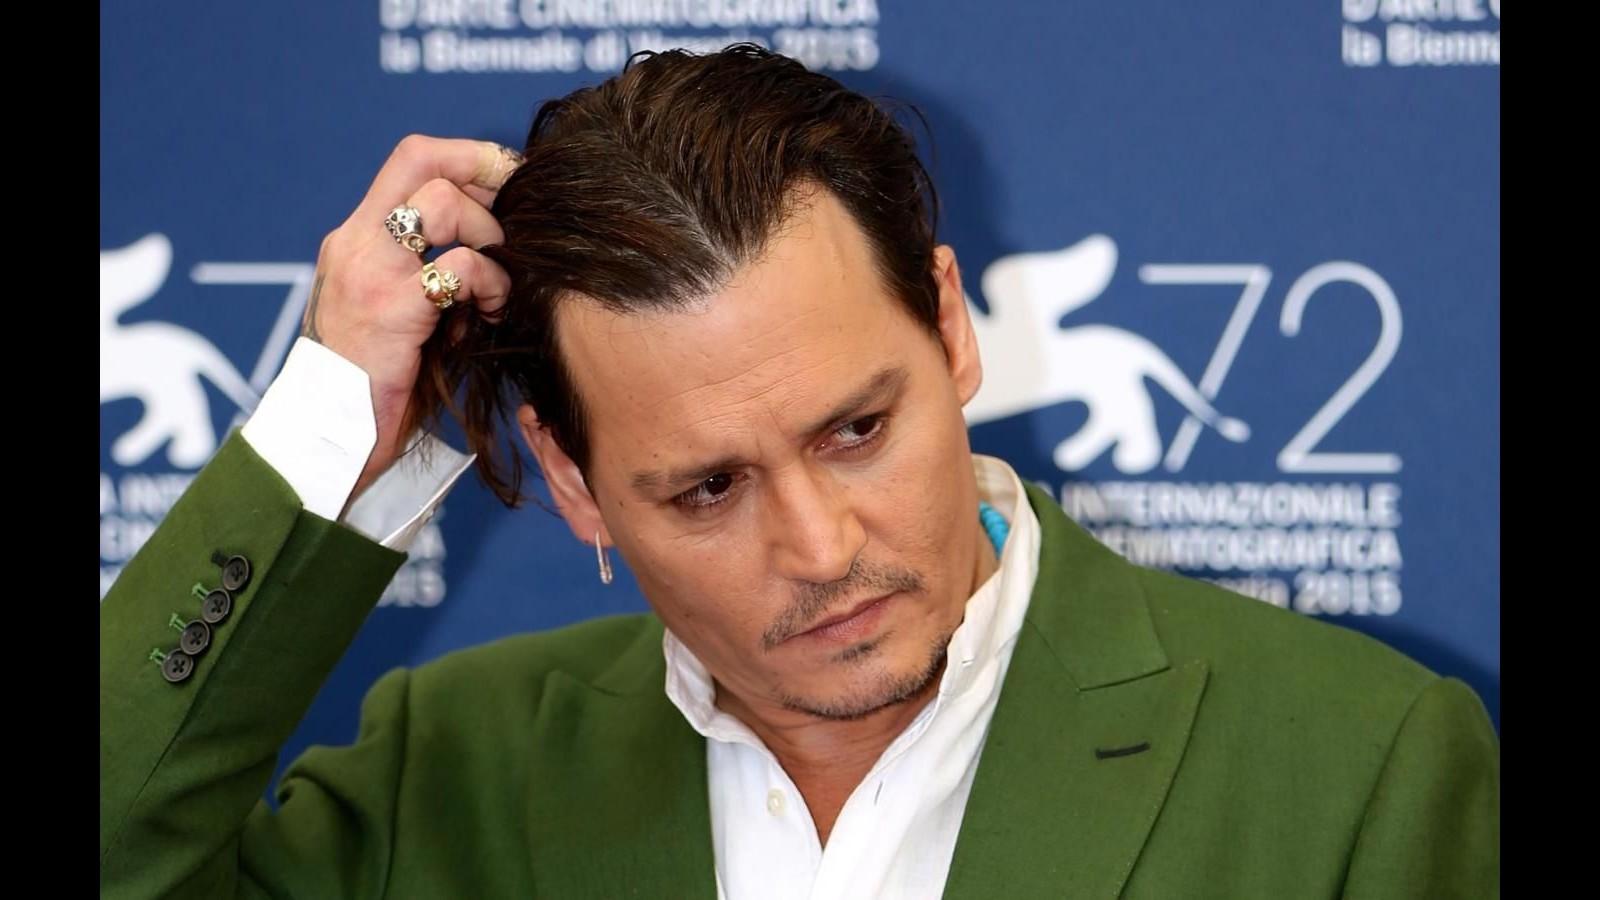 Venezia 72, Johnny Depp: I miei fan sono i miei capi